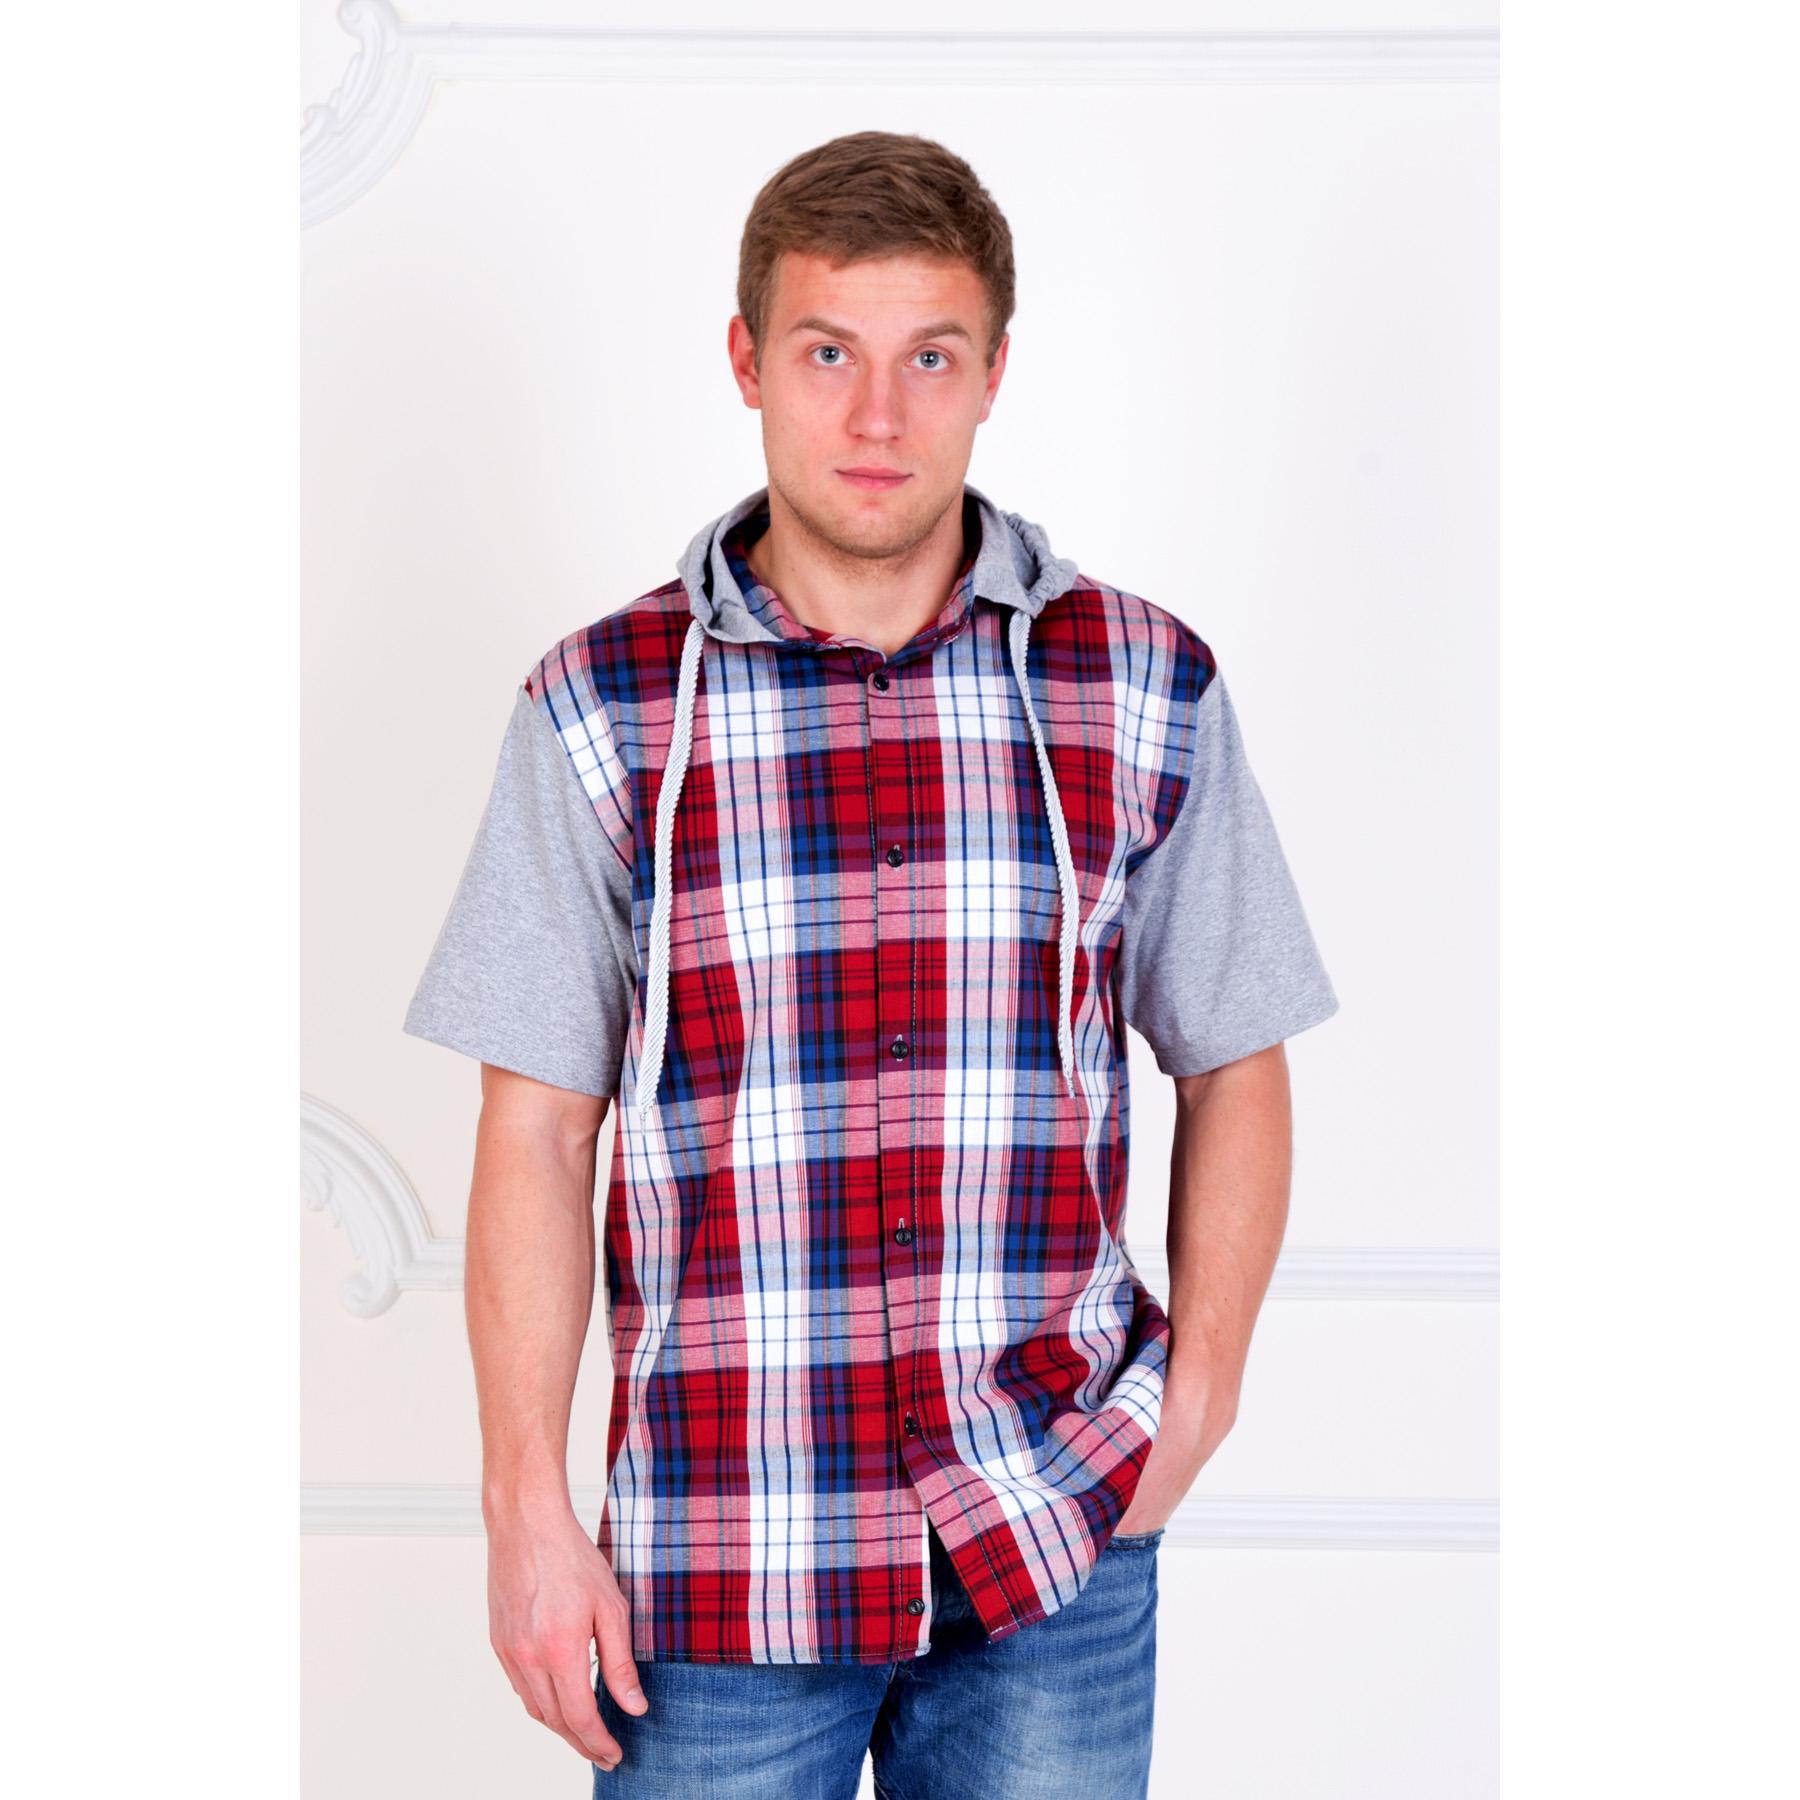 Мужская рубашка «Юстин» арт. 0032, размер 44 - Мужская одежда артикул: 16689